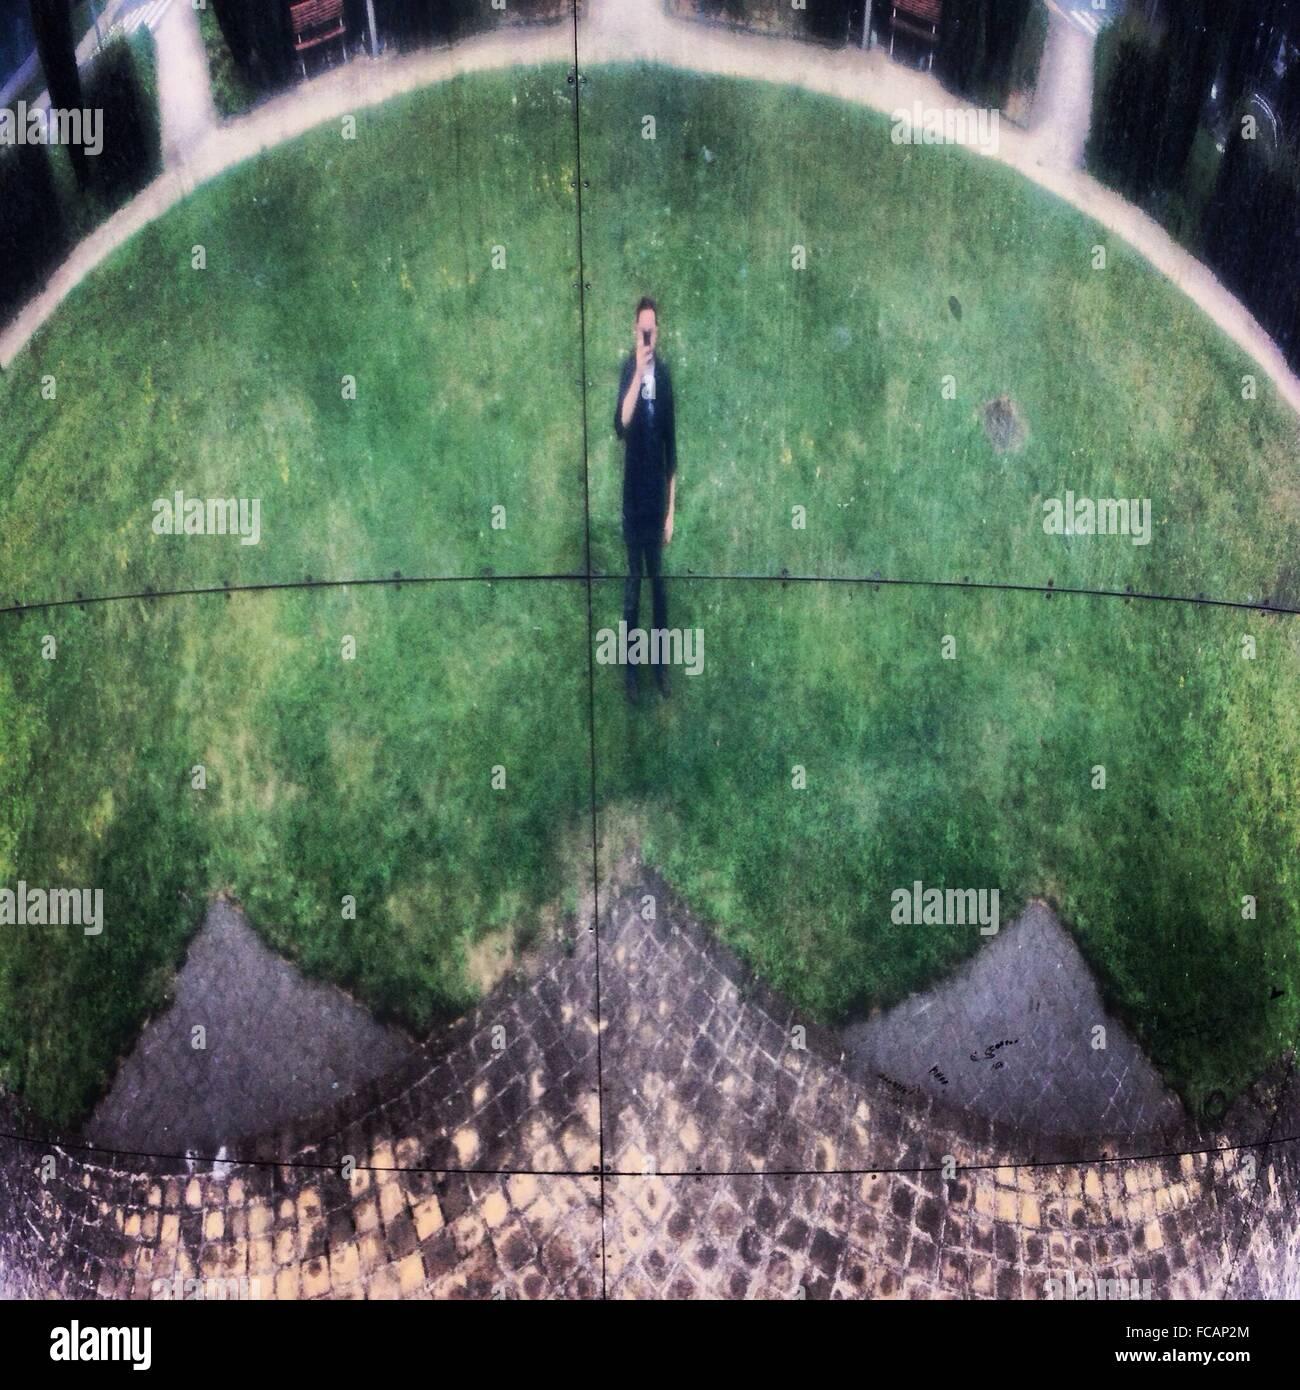 Man On Lawn Through Fisheye Lens - Stock Image